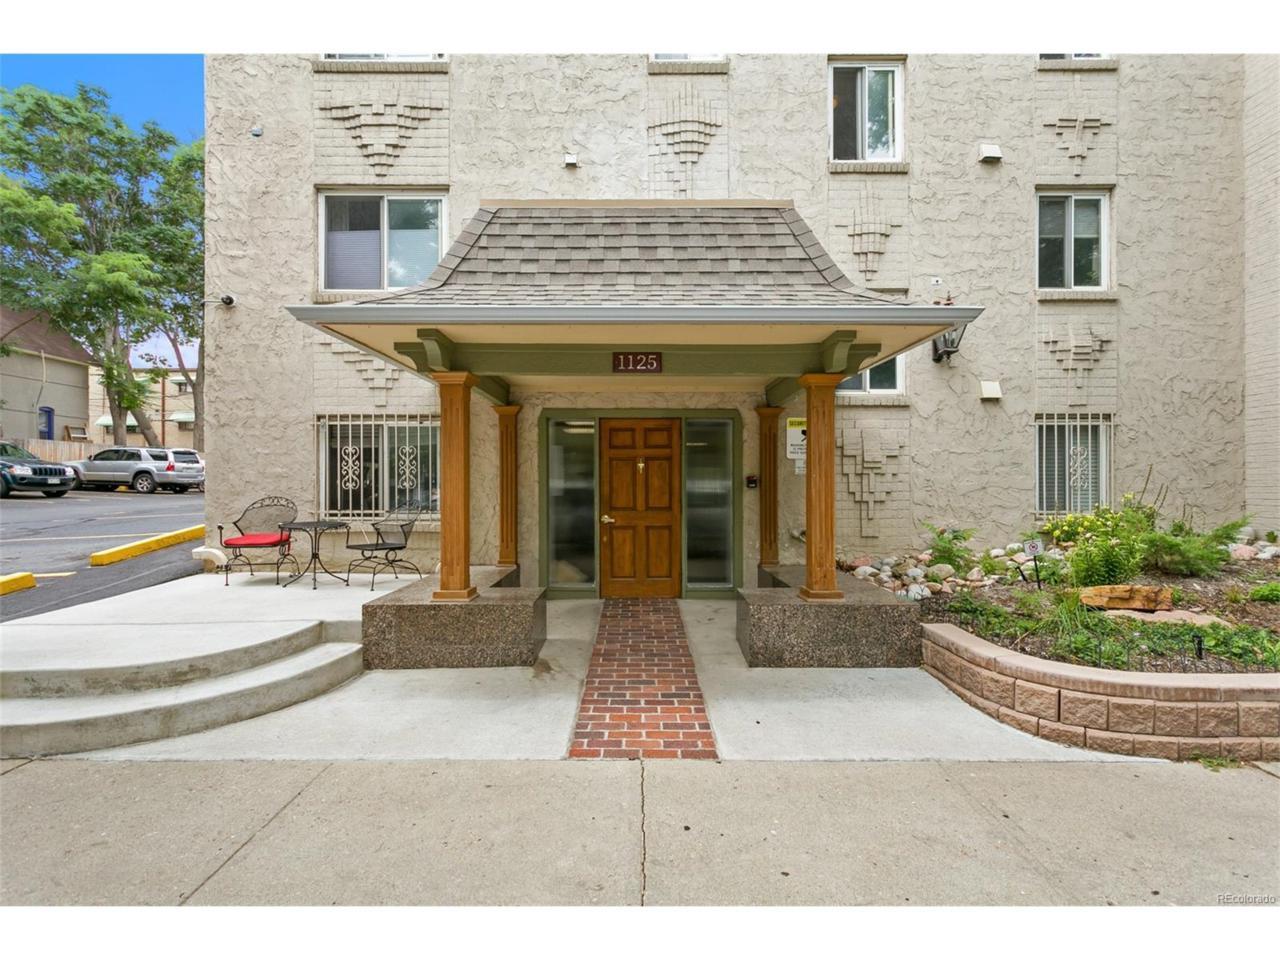 1125 Washington Street #502, Denver, CO 80203 (MLS #9837812) :: 8z Real Estate